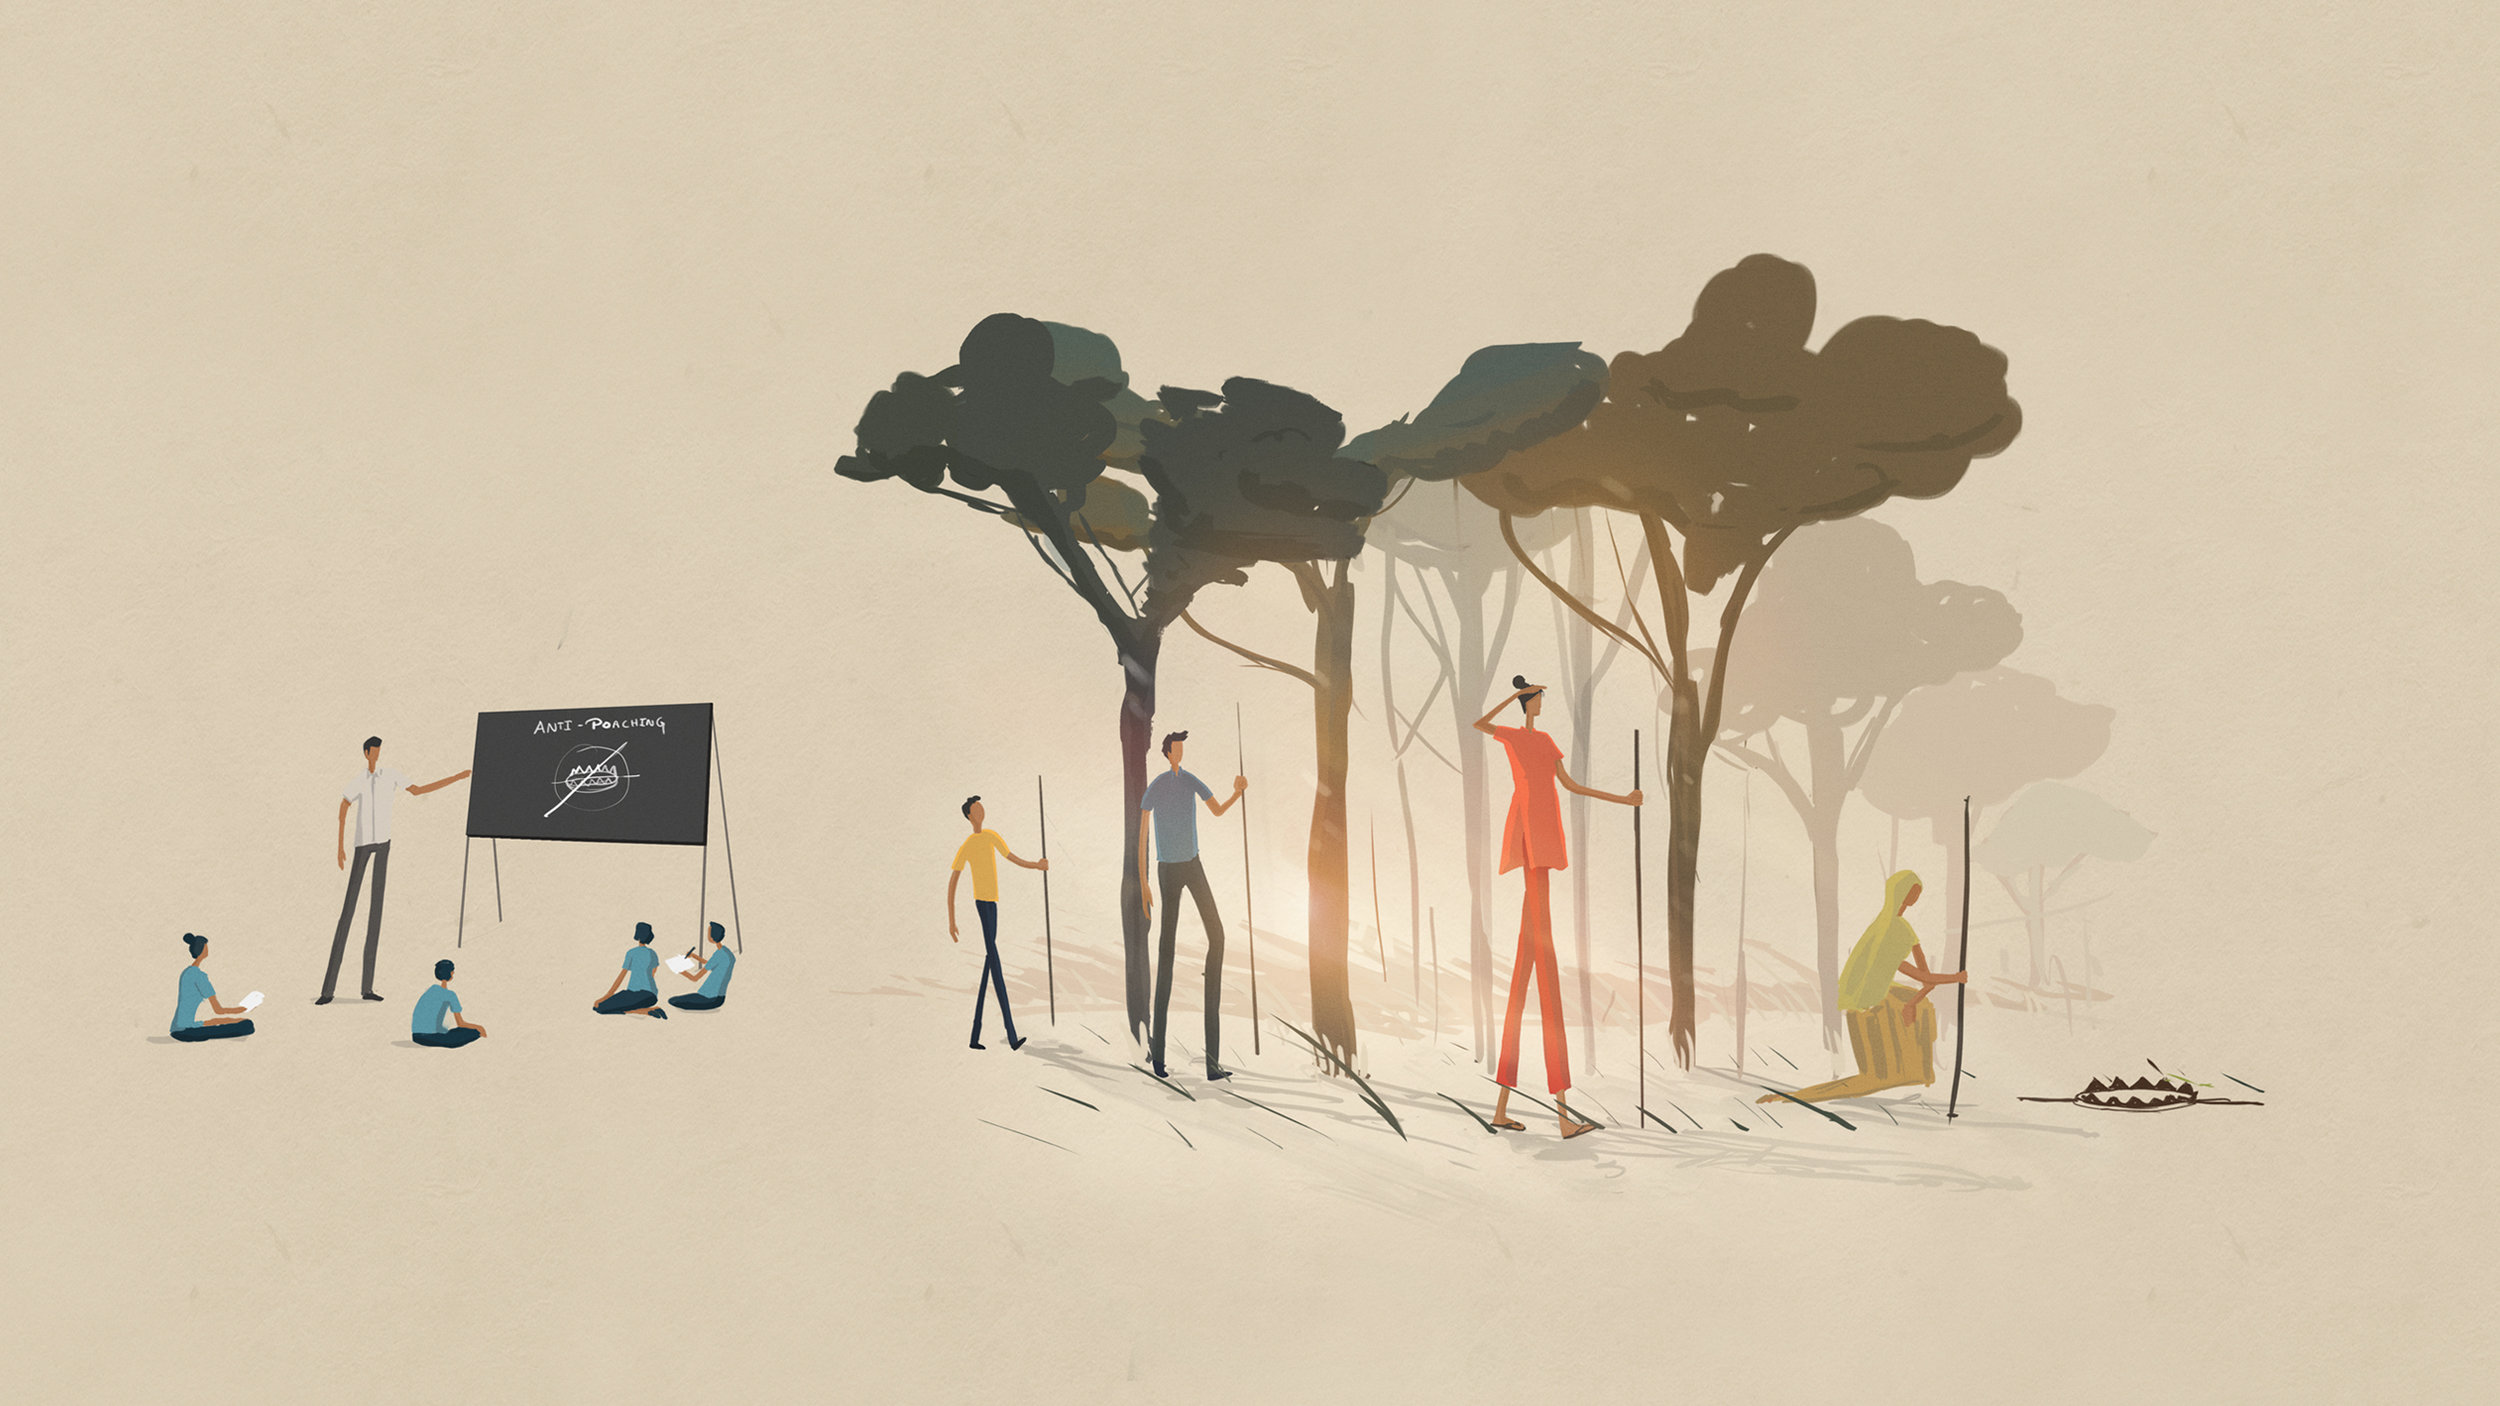 25th anniversary illustrations